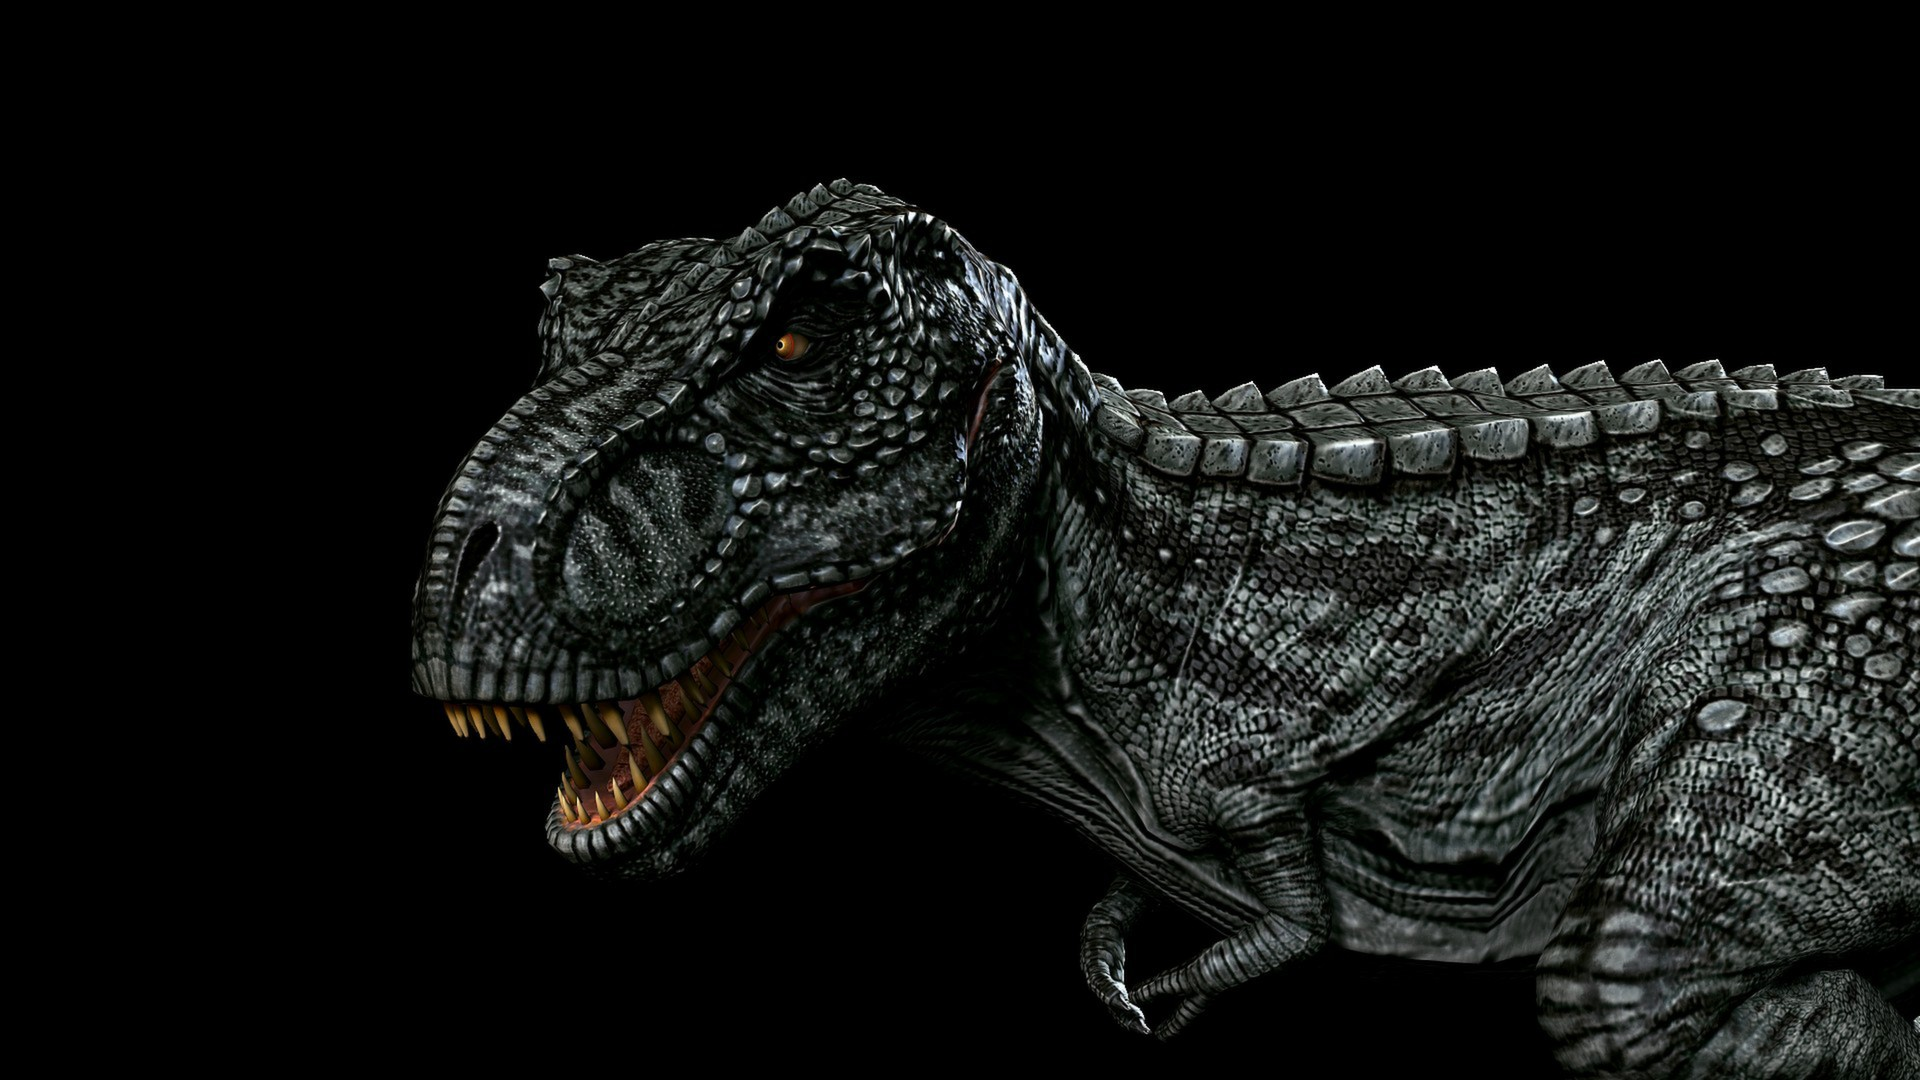 PRIMAL CARNAGE fantasy dinosaur u wallpaper 1920x1080 169029 1920x1080